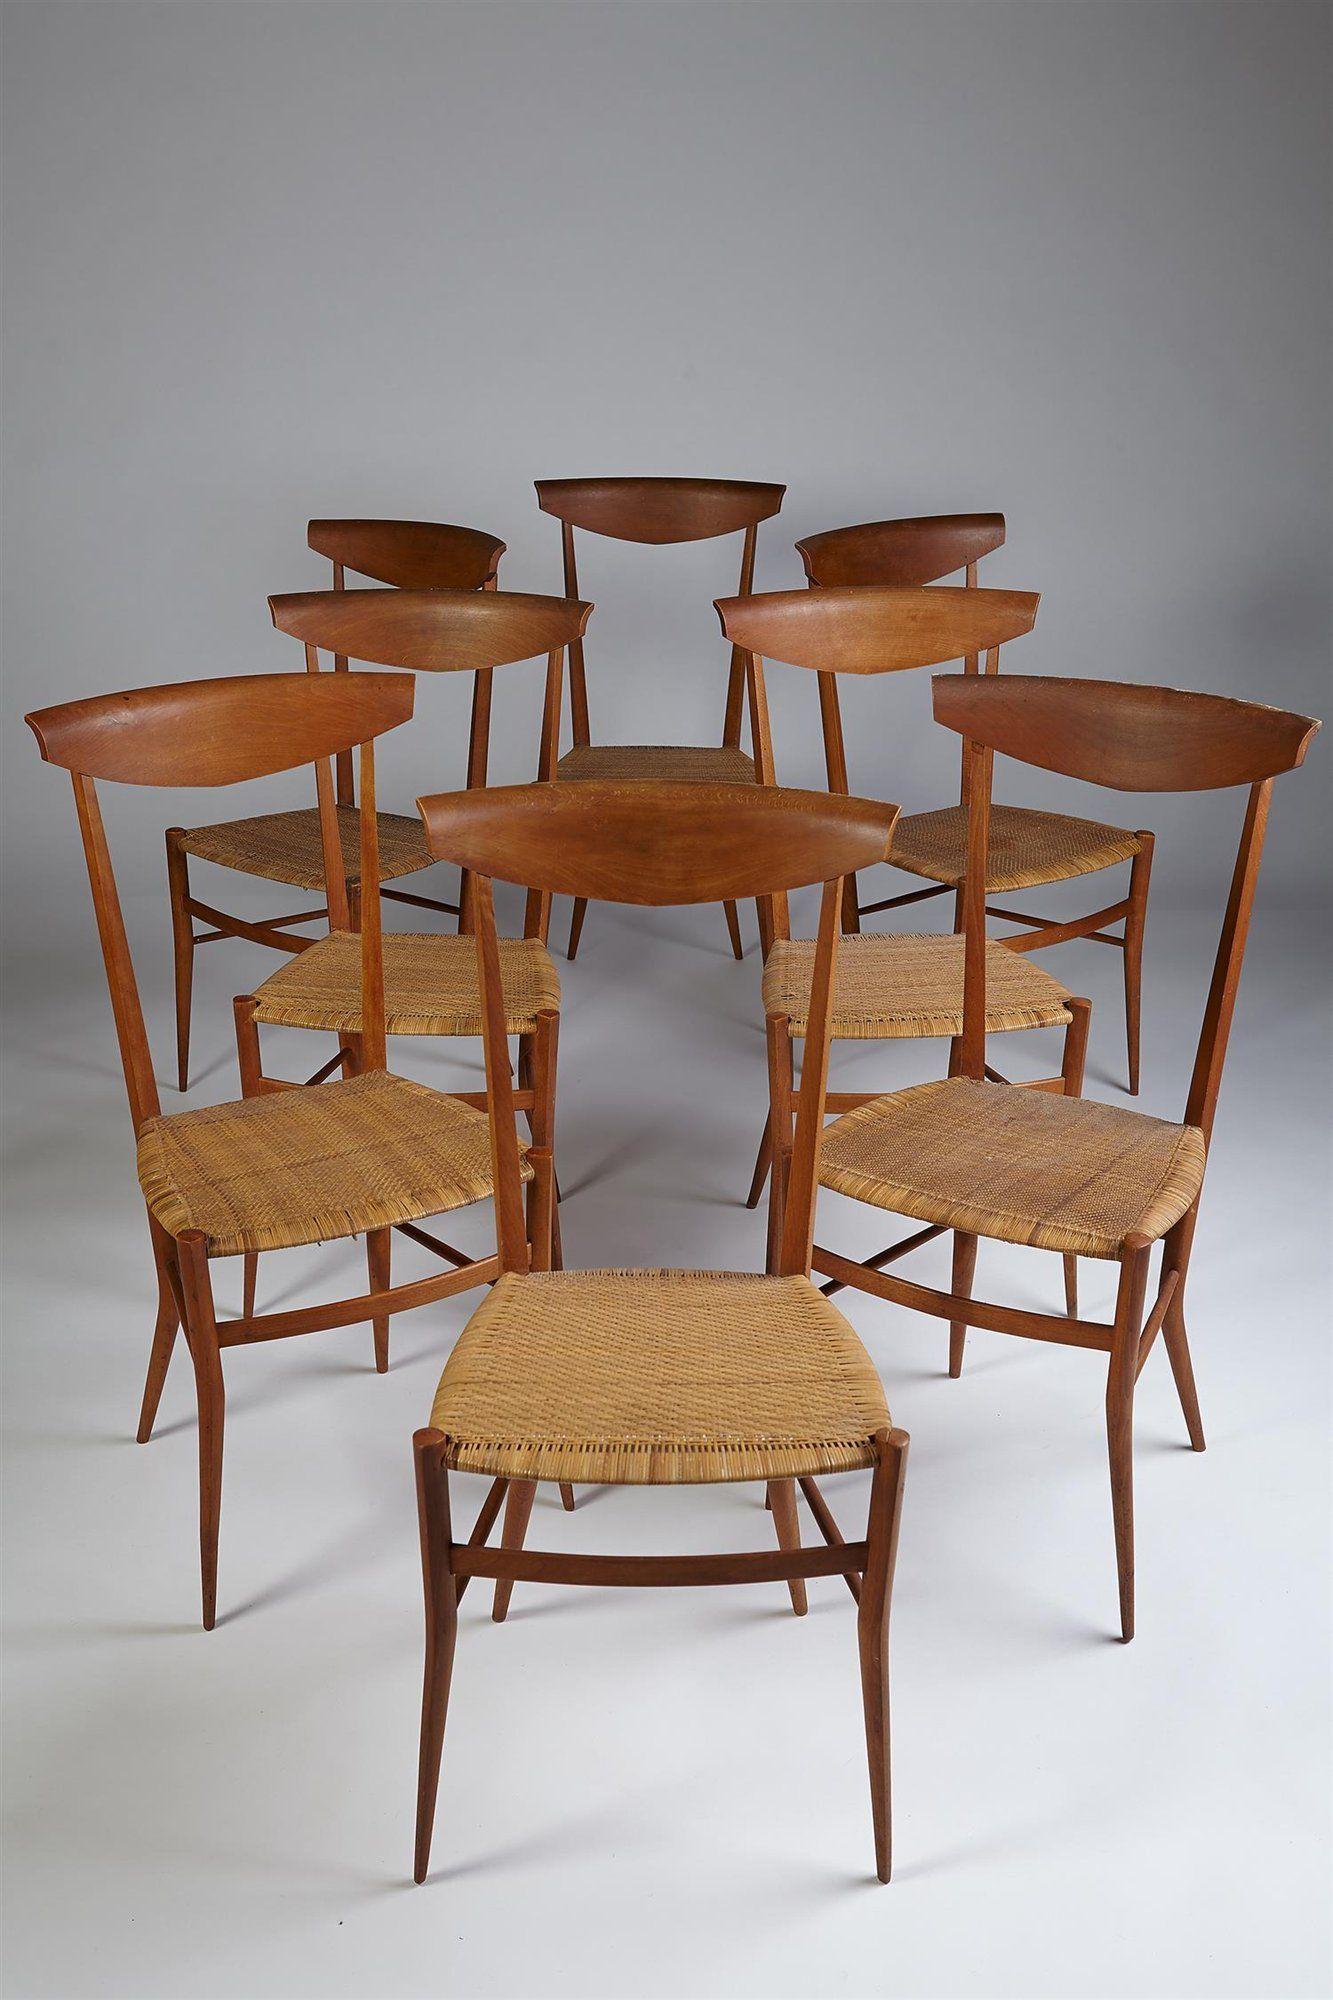 Set of eight chairs Chiavari Made by Sanguinetti Italy 1950 s